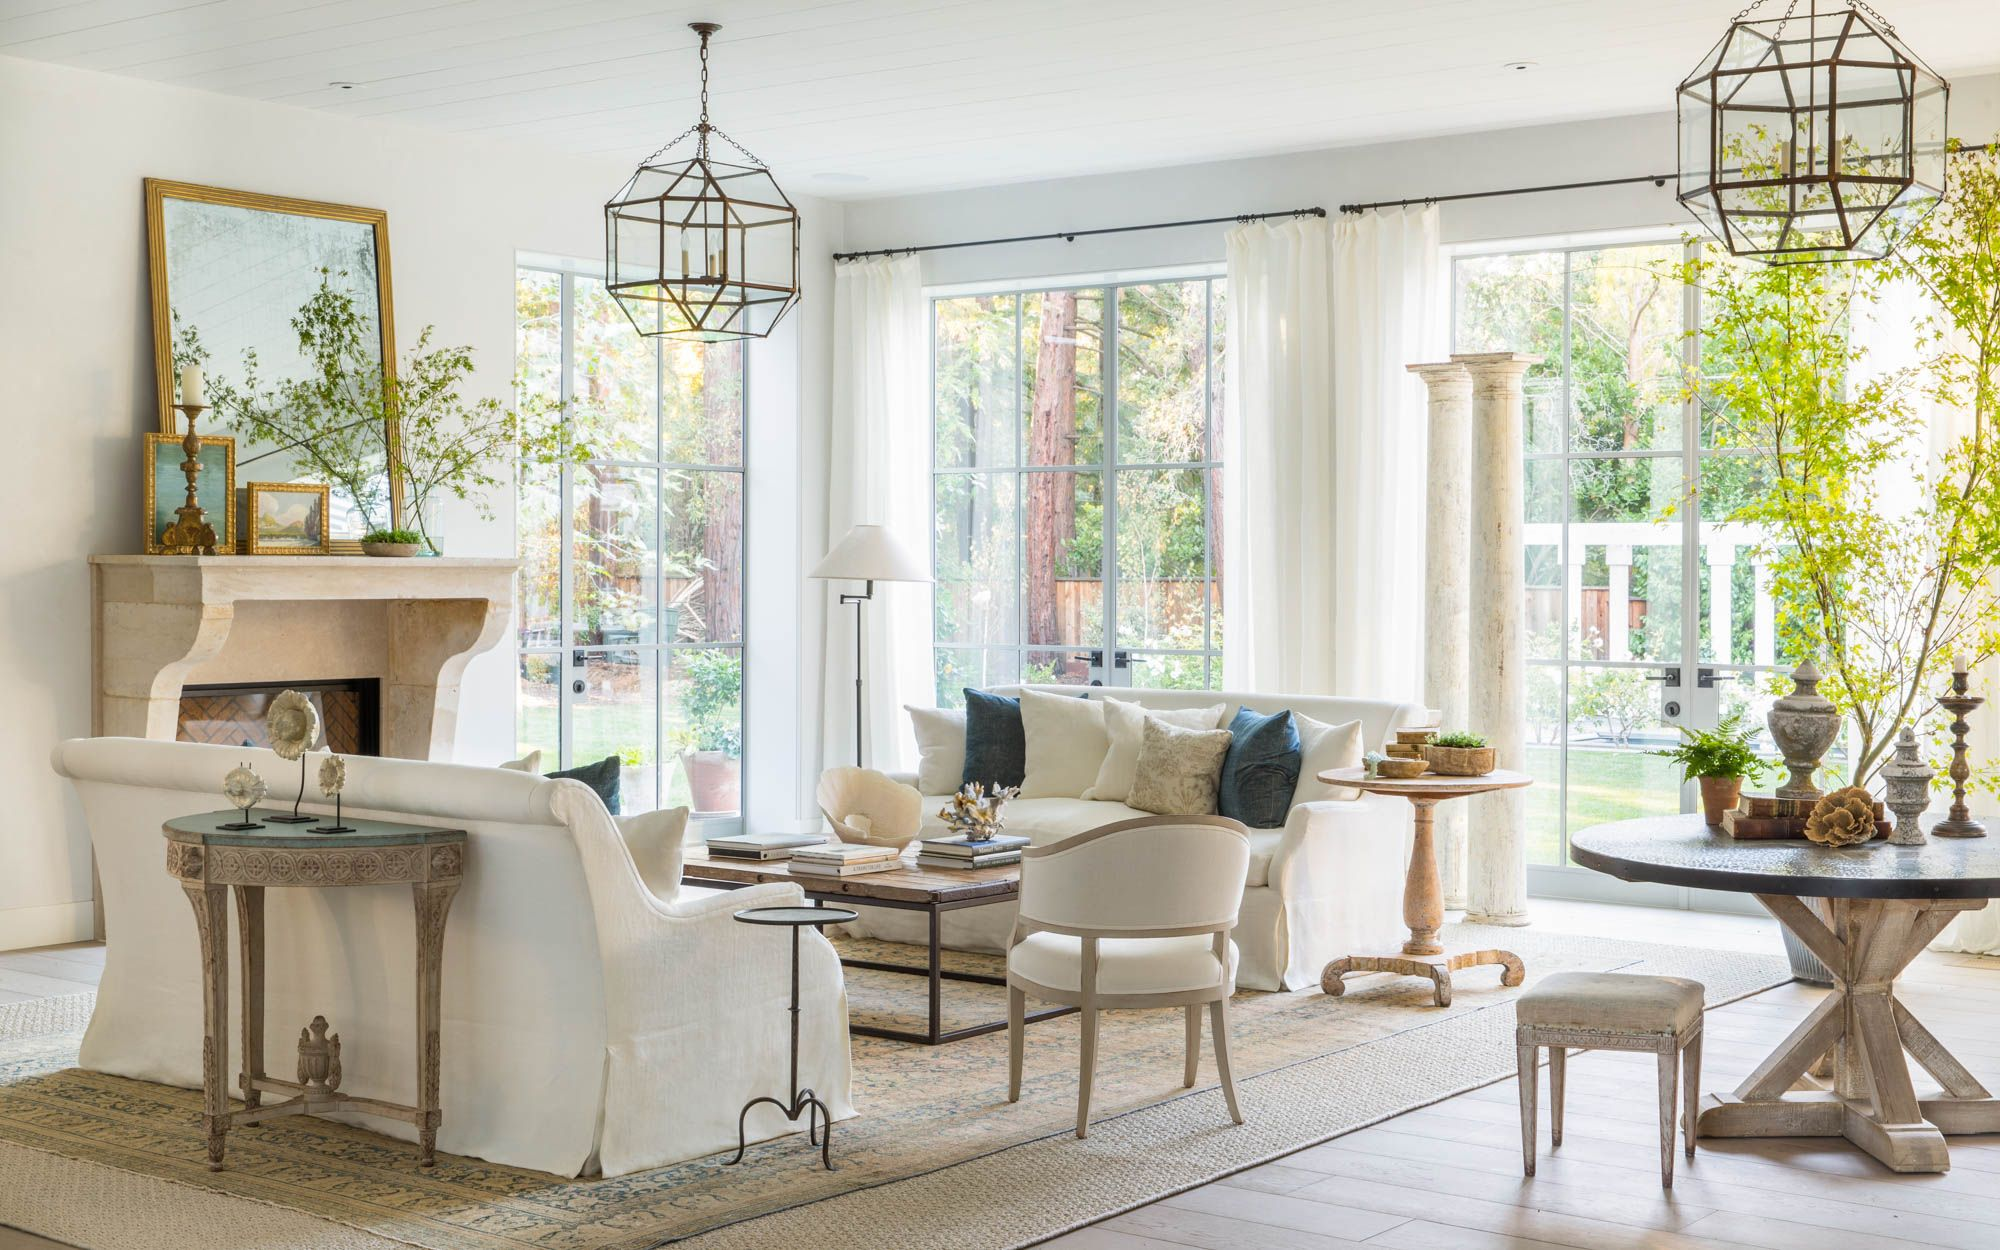 A Californian Home Decorated in Elegant Neutrals | Modern ...